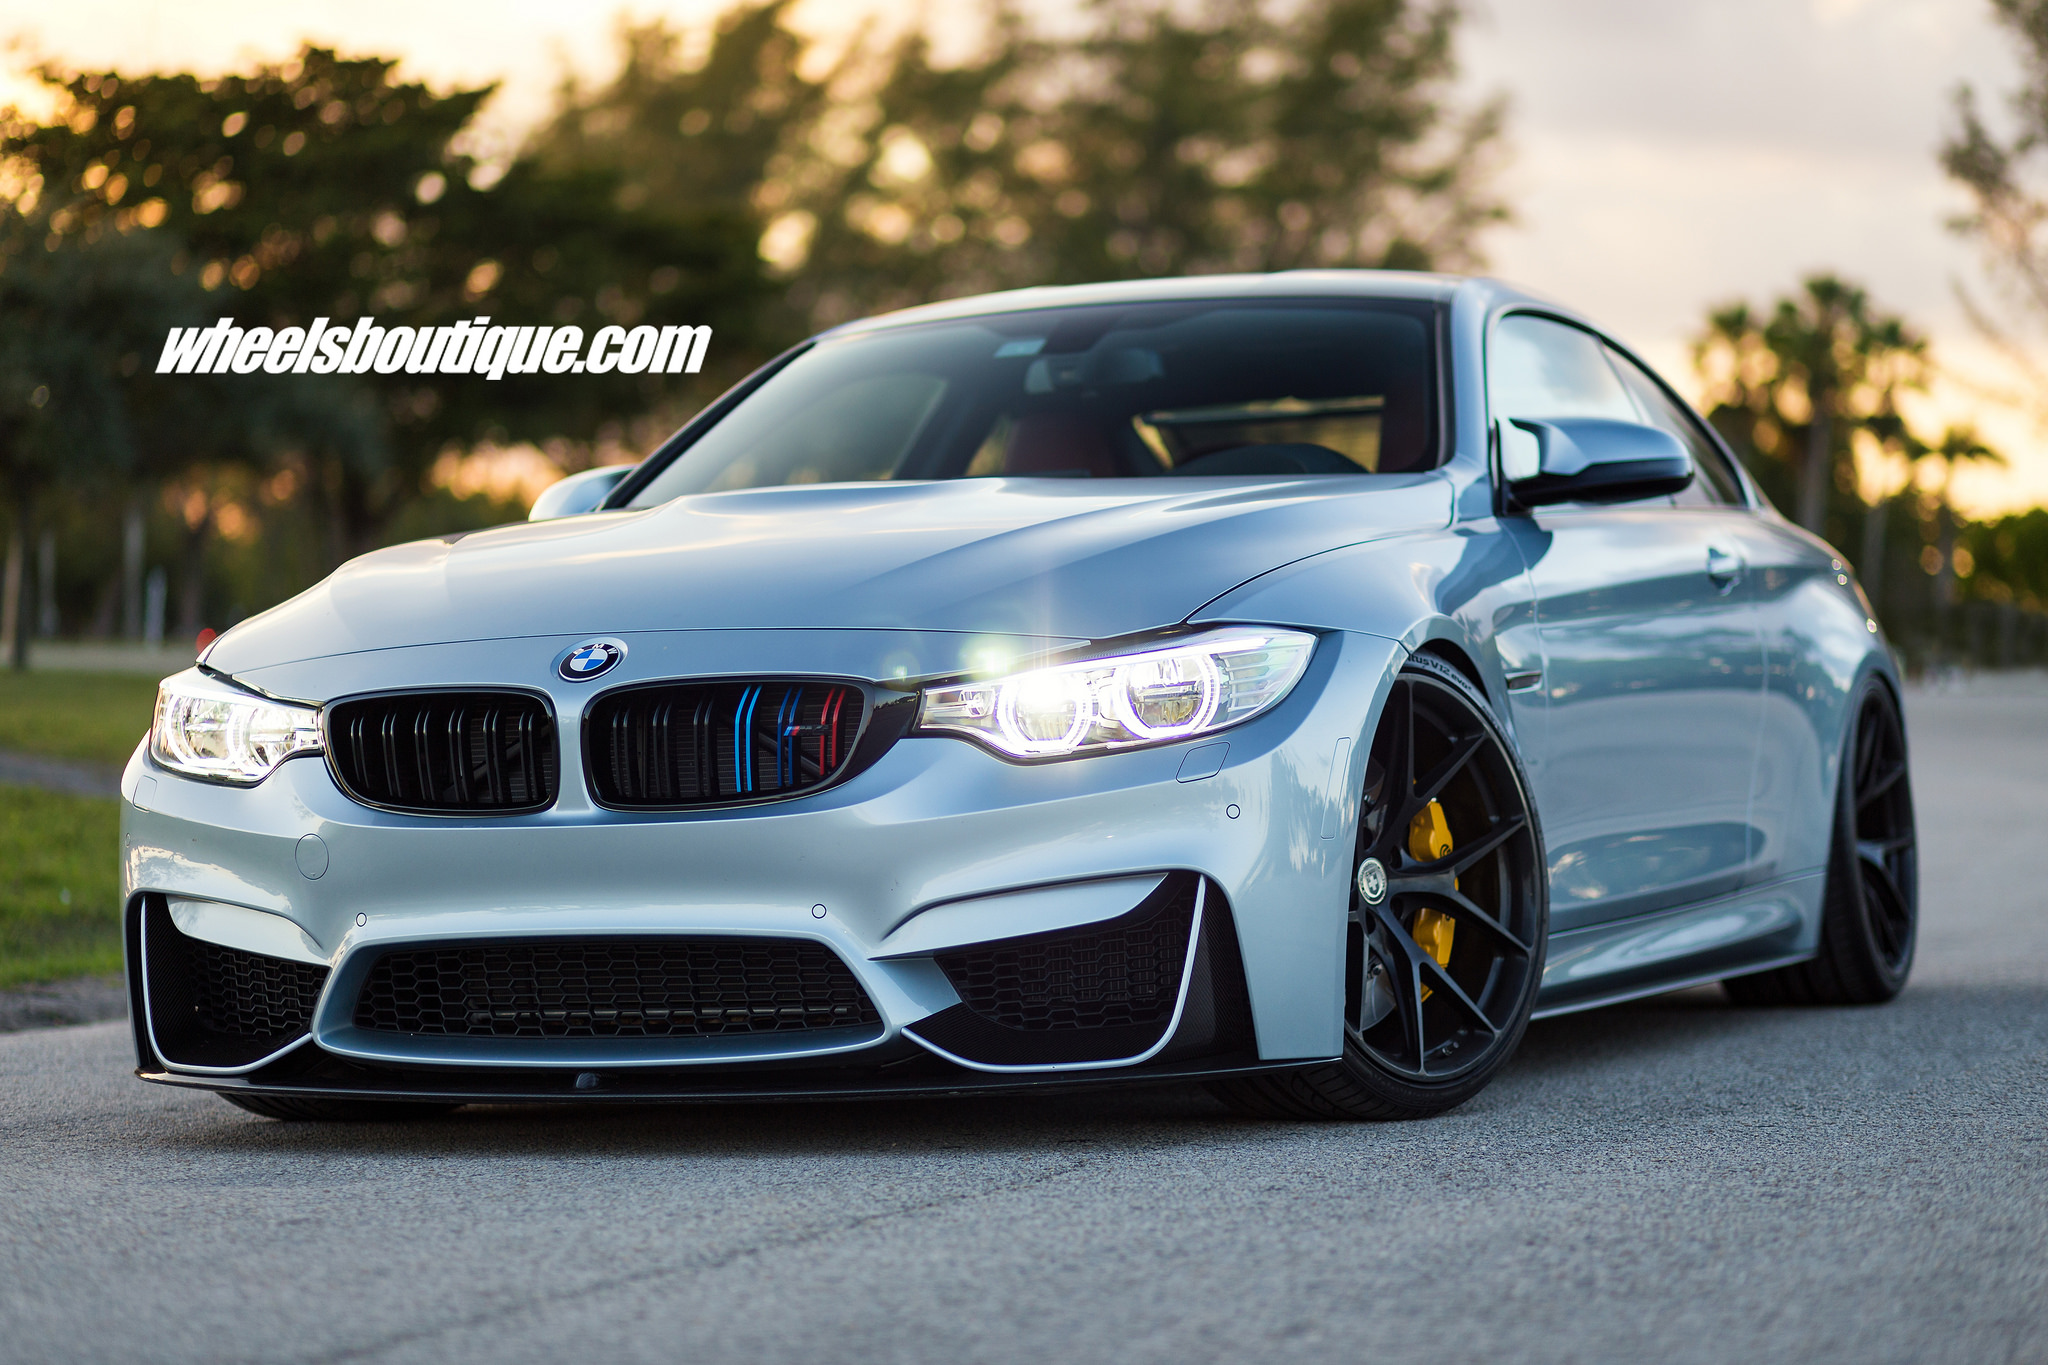 F BMW M Looks Gorgeous On HRE Wheels BMWCoop - Best bmw wheels